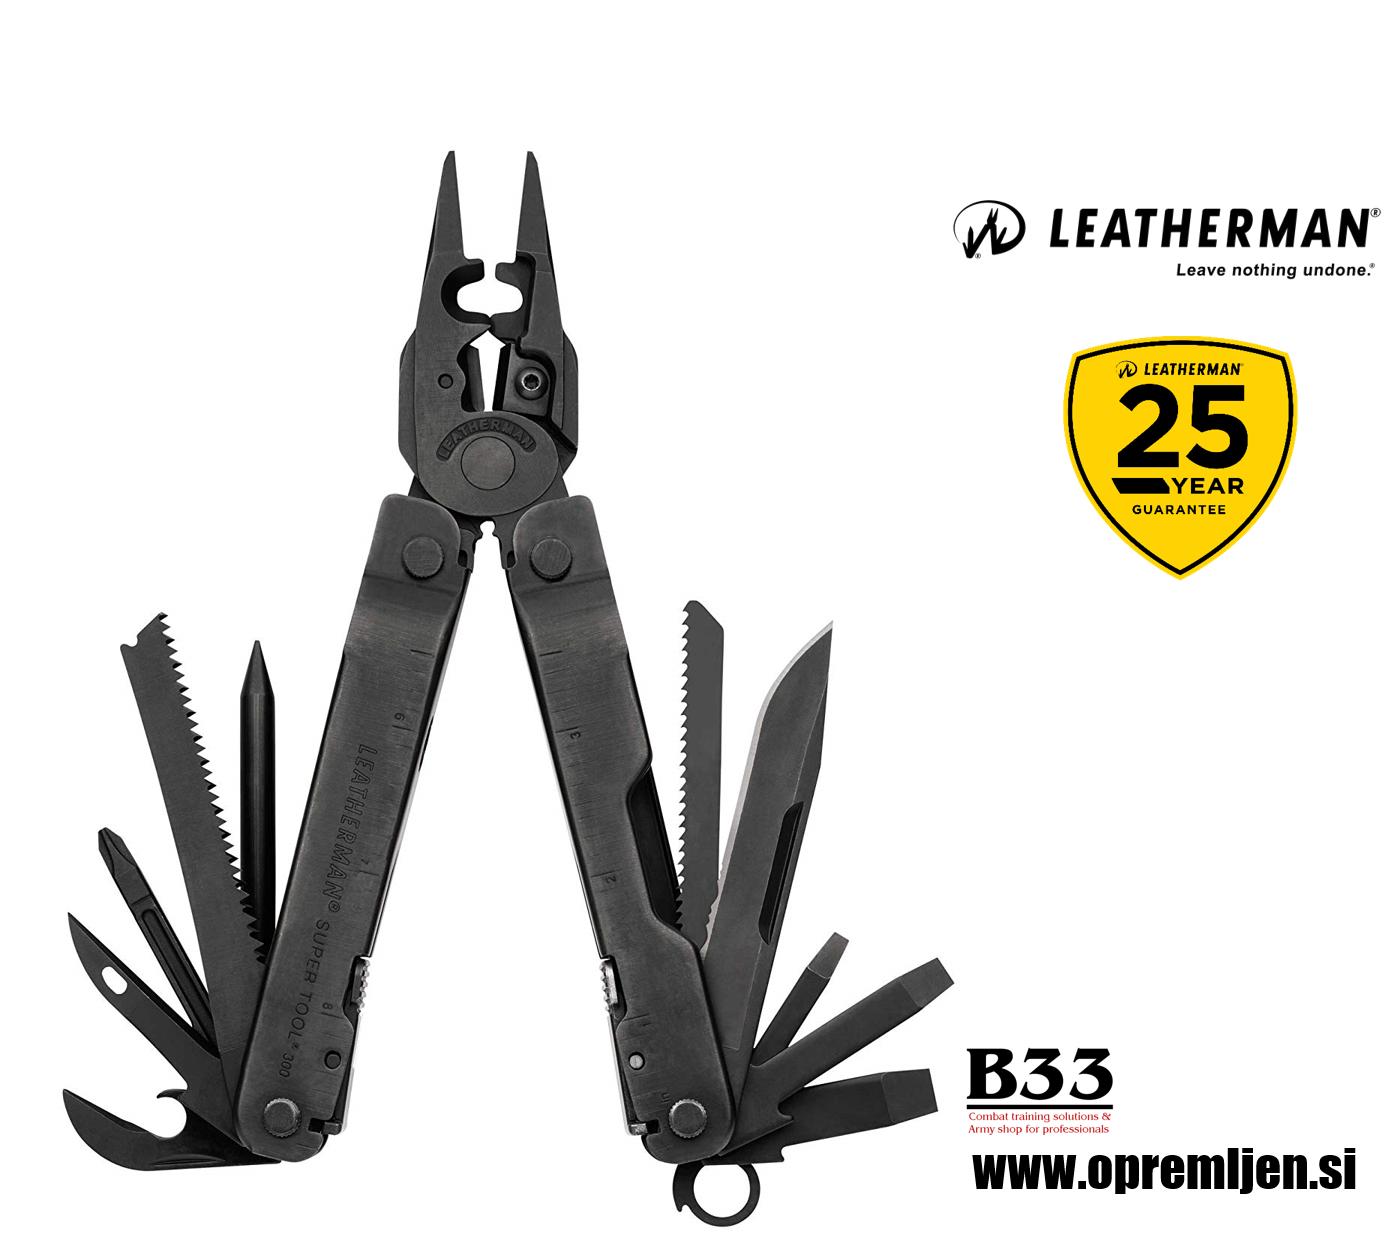 B33 army shop - Leatherman – Super Tool 300 EOD – večnamensko vojaško orodje, by B33 army shop at www.opremljen.si, trgovina z vojaško opremo, vojaška trgovina